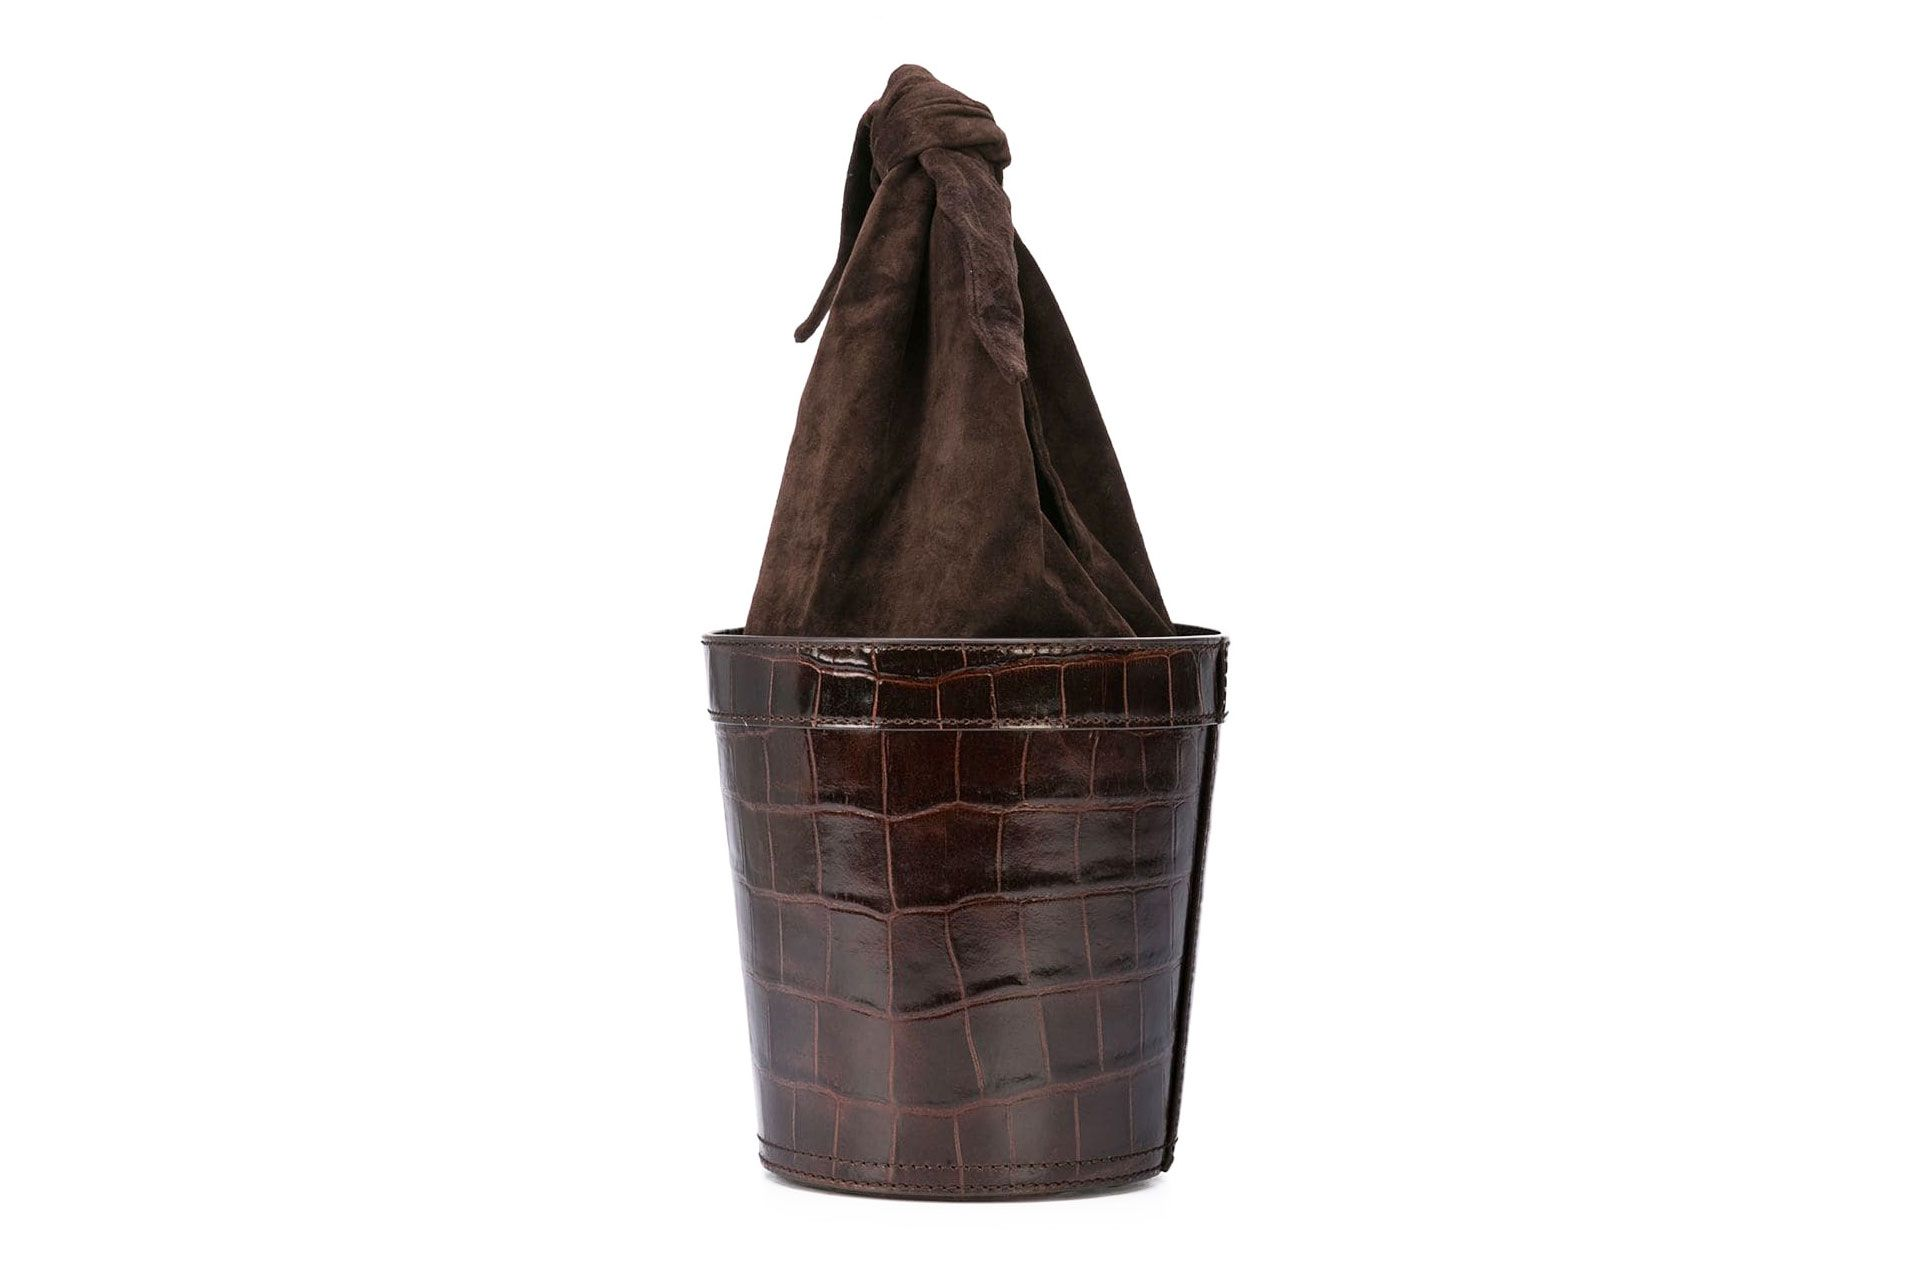 Staud Britt croc-effect leather and suede bucket bag